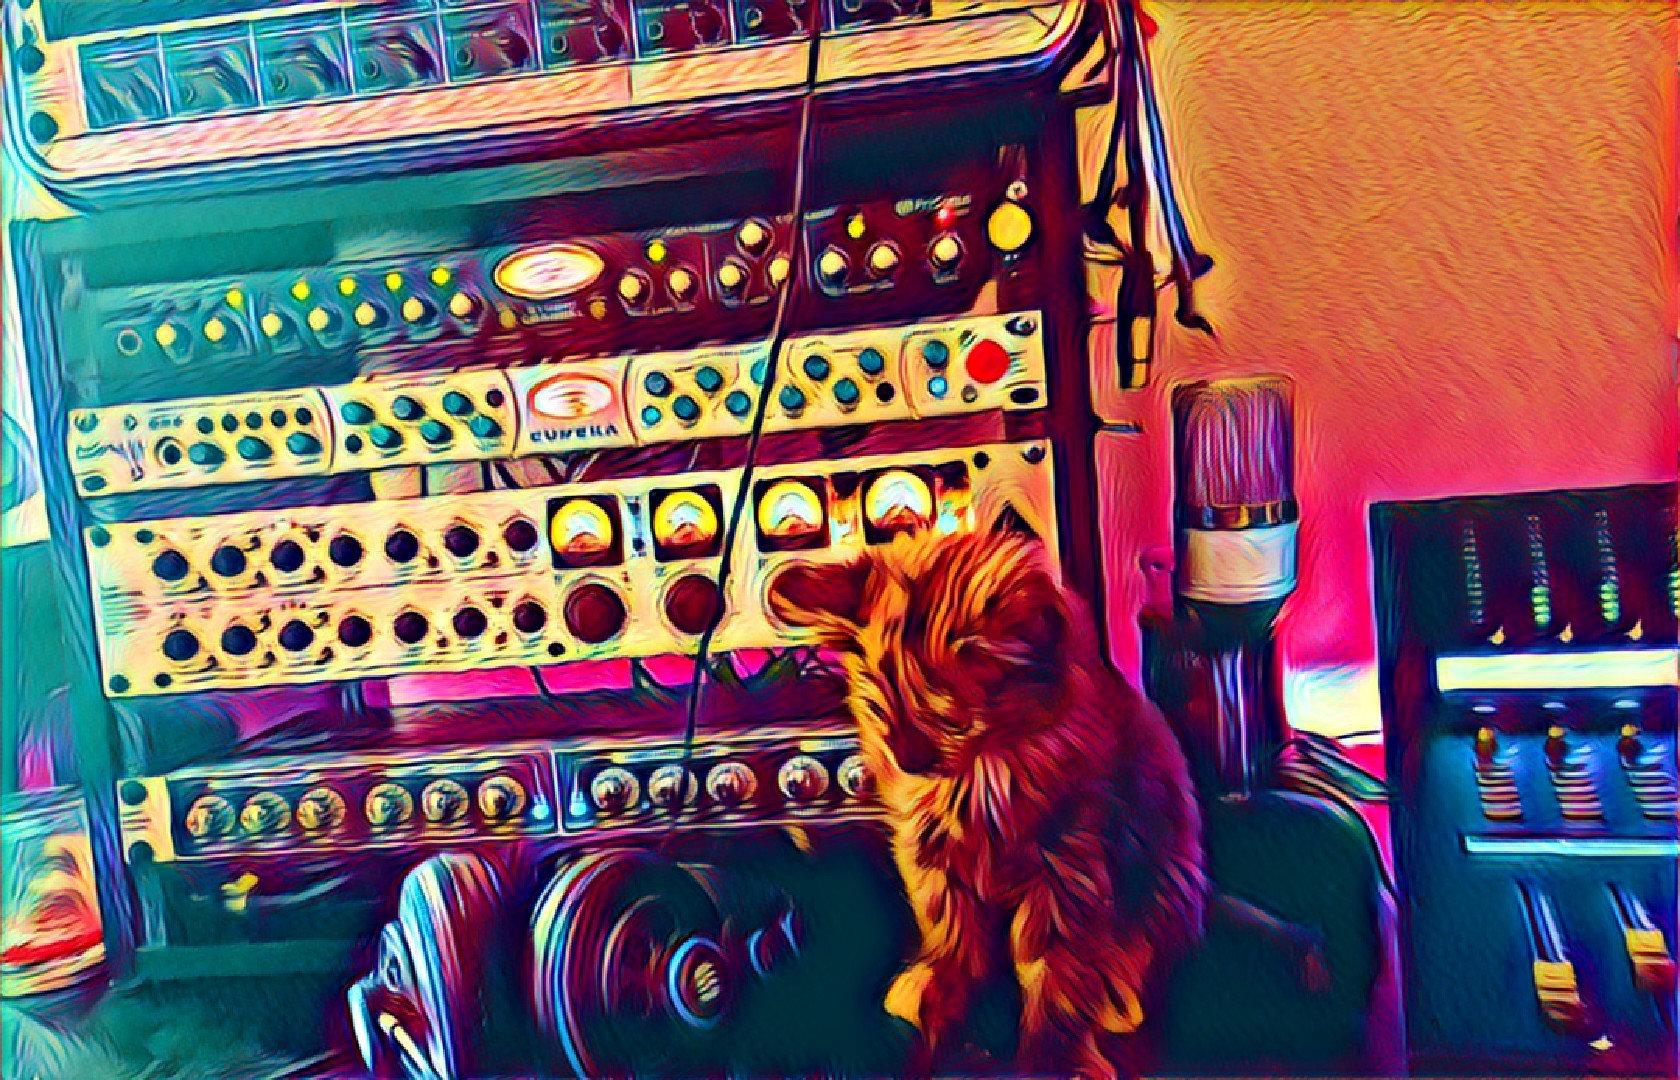 Podcast: Edit, Mix, Master